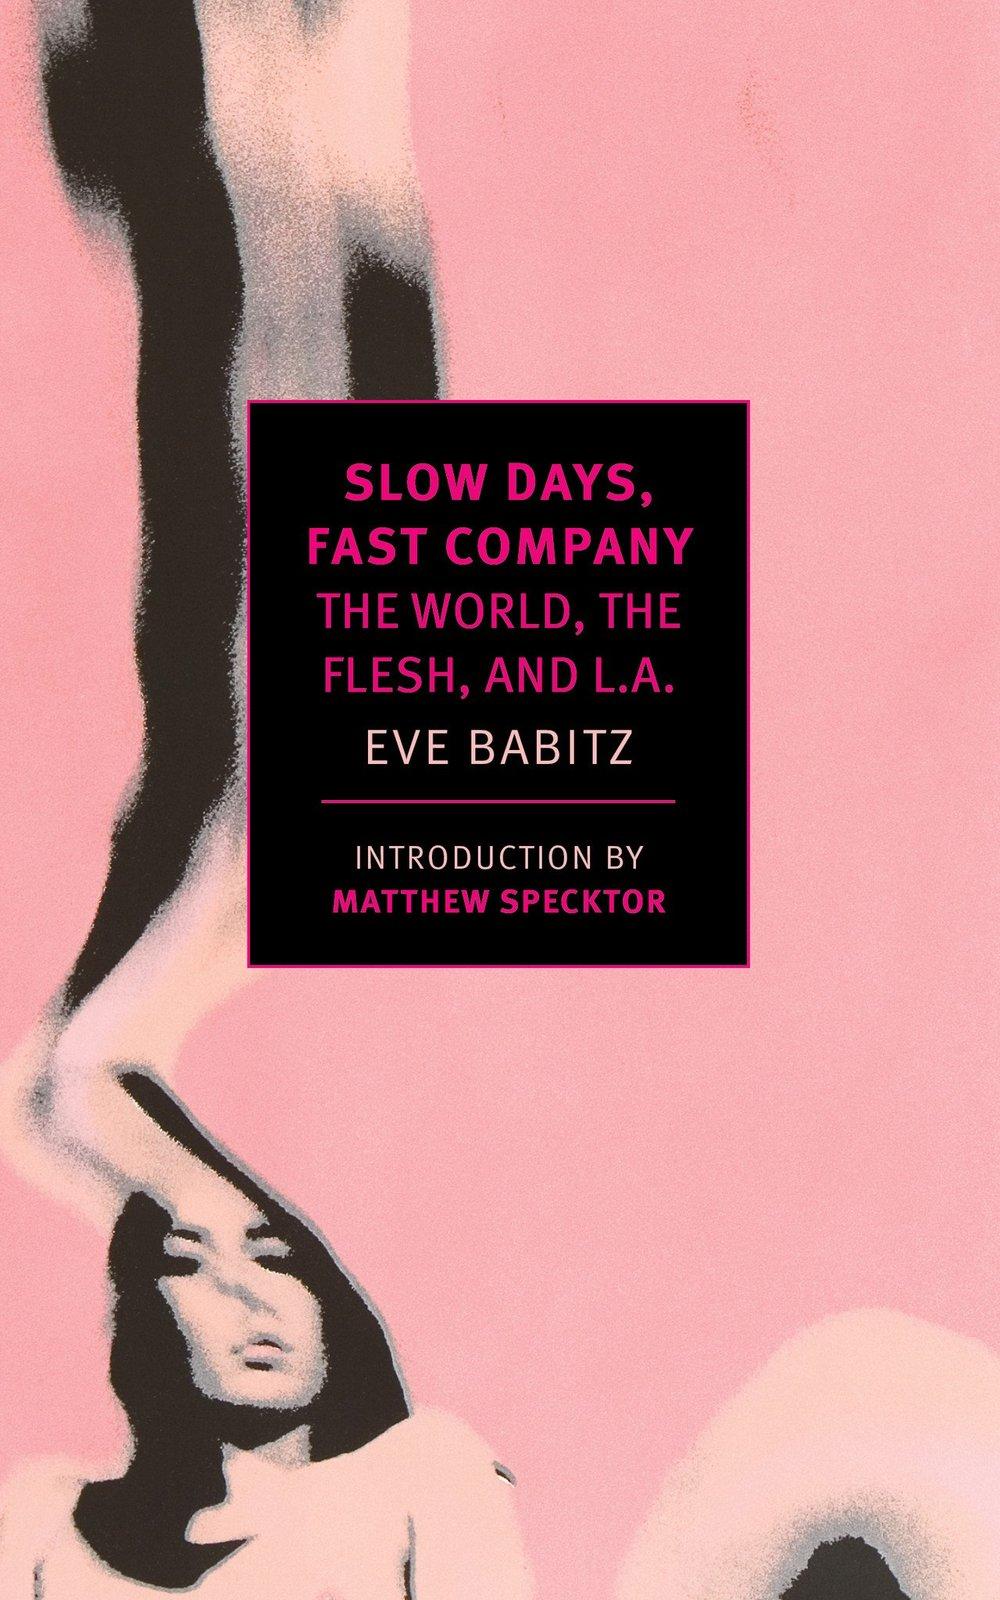 babitz.Slow_Days_hi-res_2048x2048.jpg